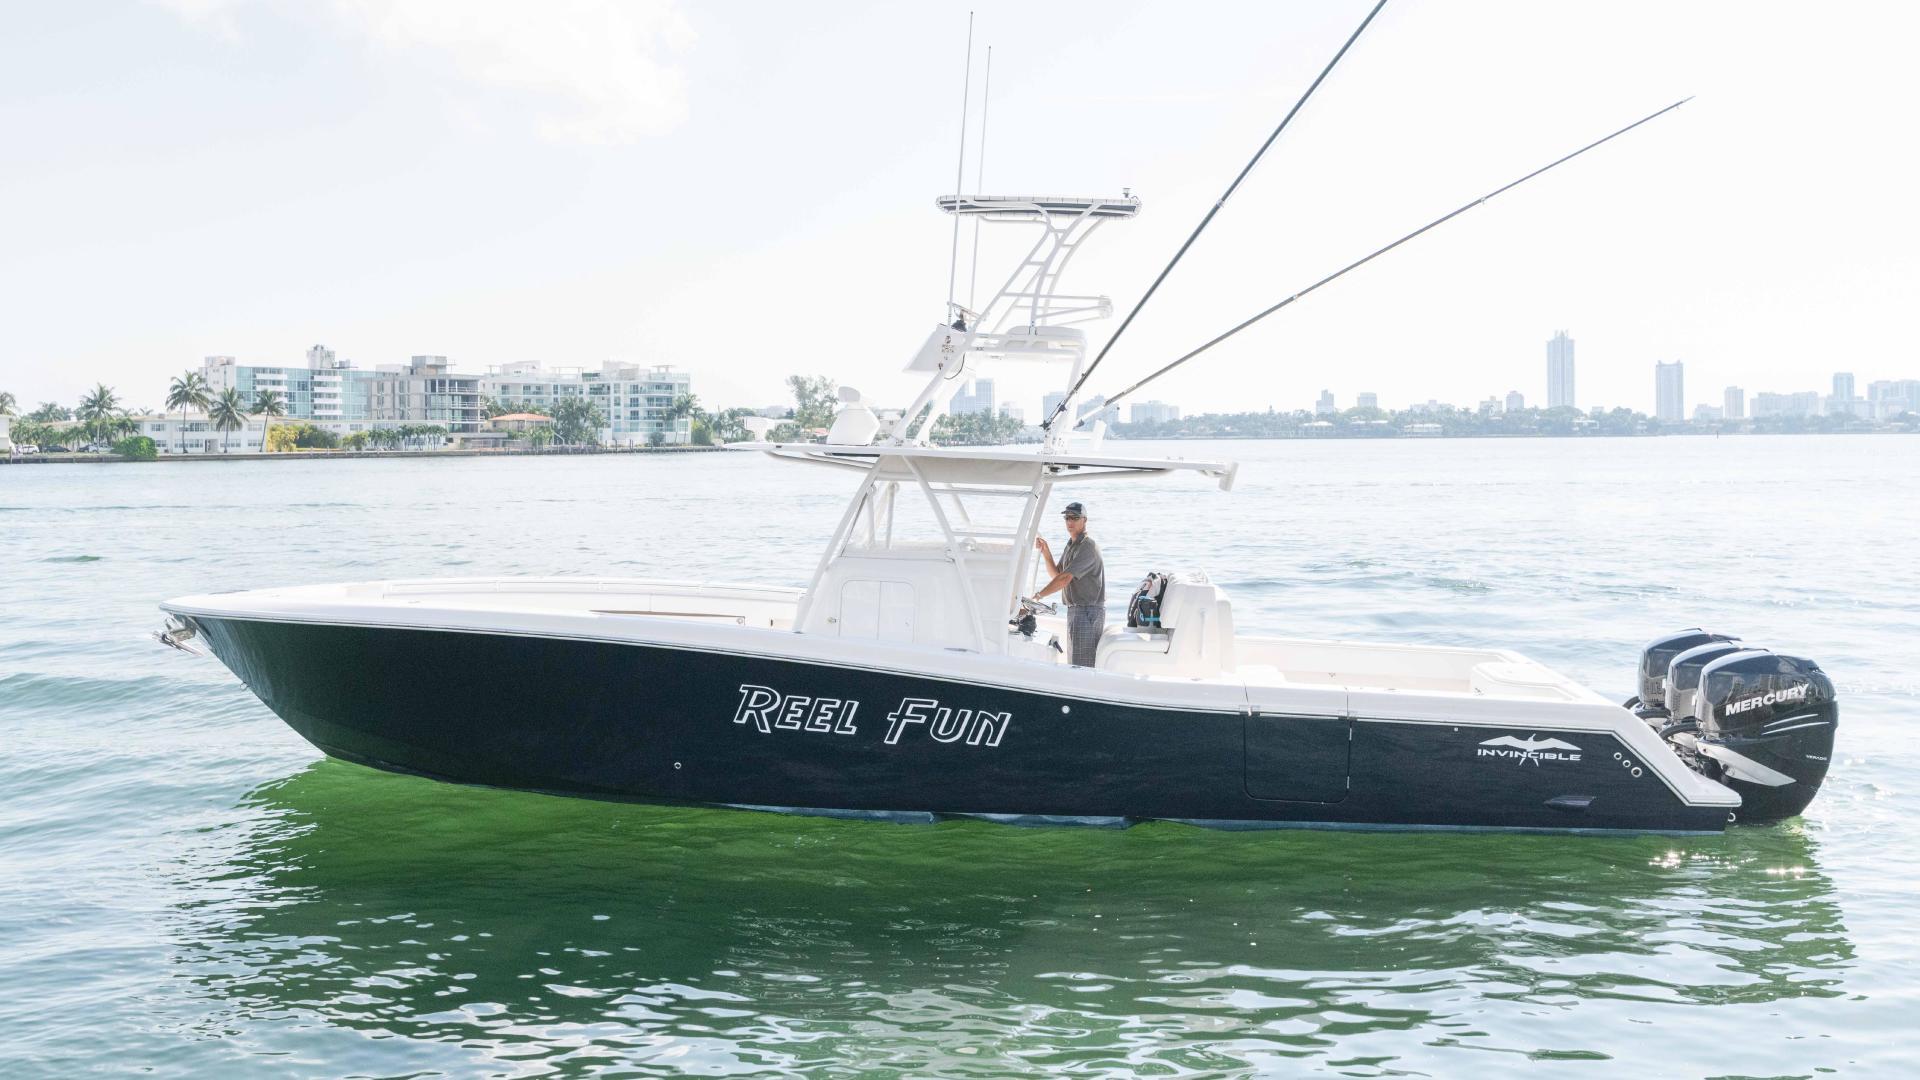 Invincible-39 2016-Reel Fun Miami-Florida-United States-1268301 | Thumbnail